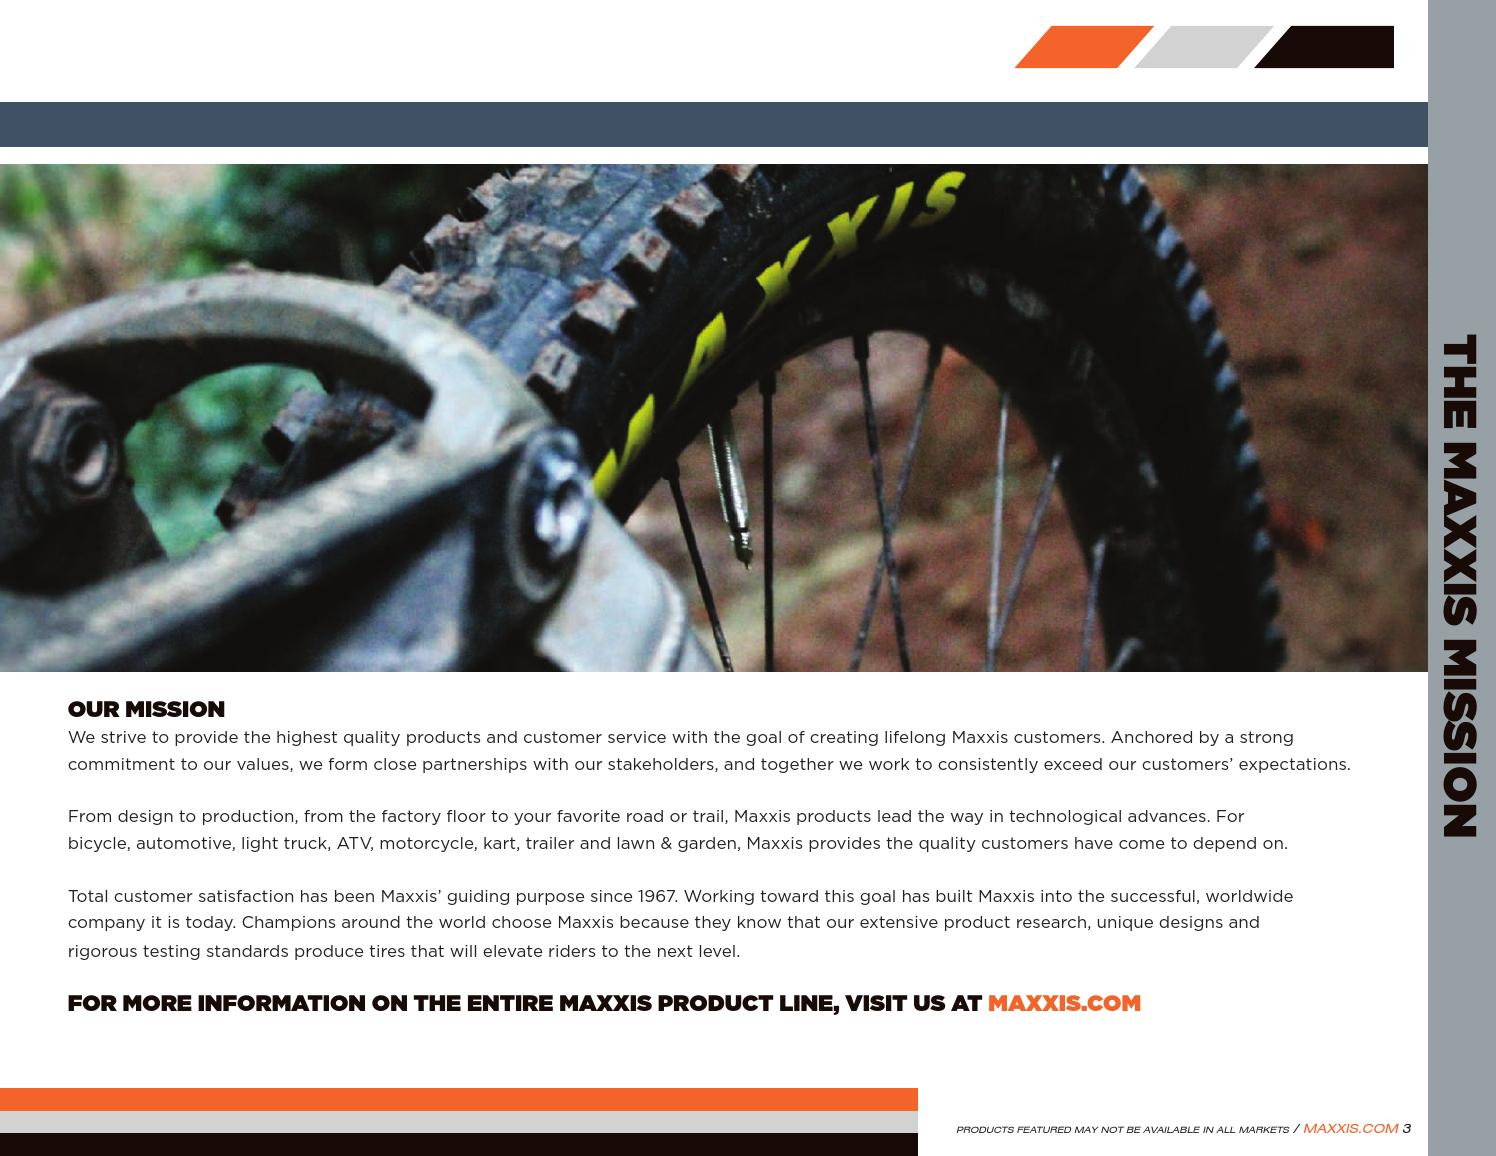 20x2.15 Maxxis Rizer Foldable Kevlar BMX Tire